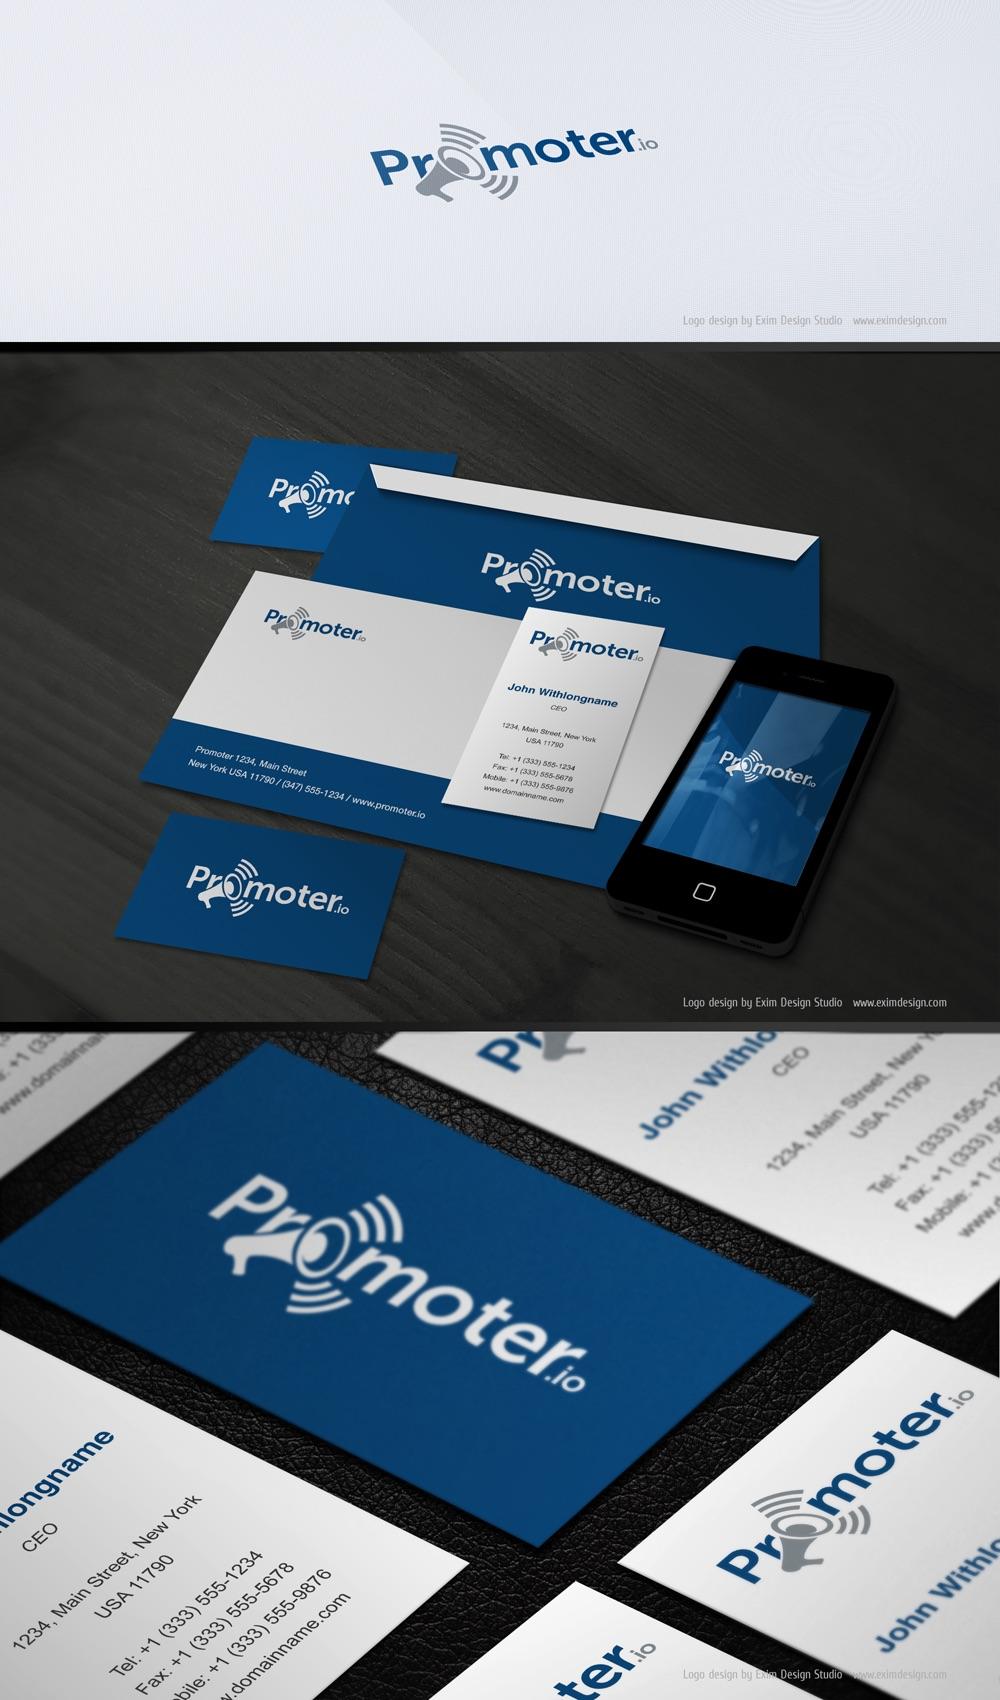 eximdesign_promoter_1.jpg